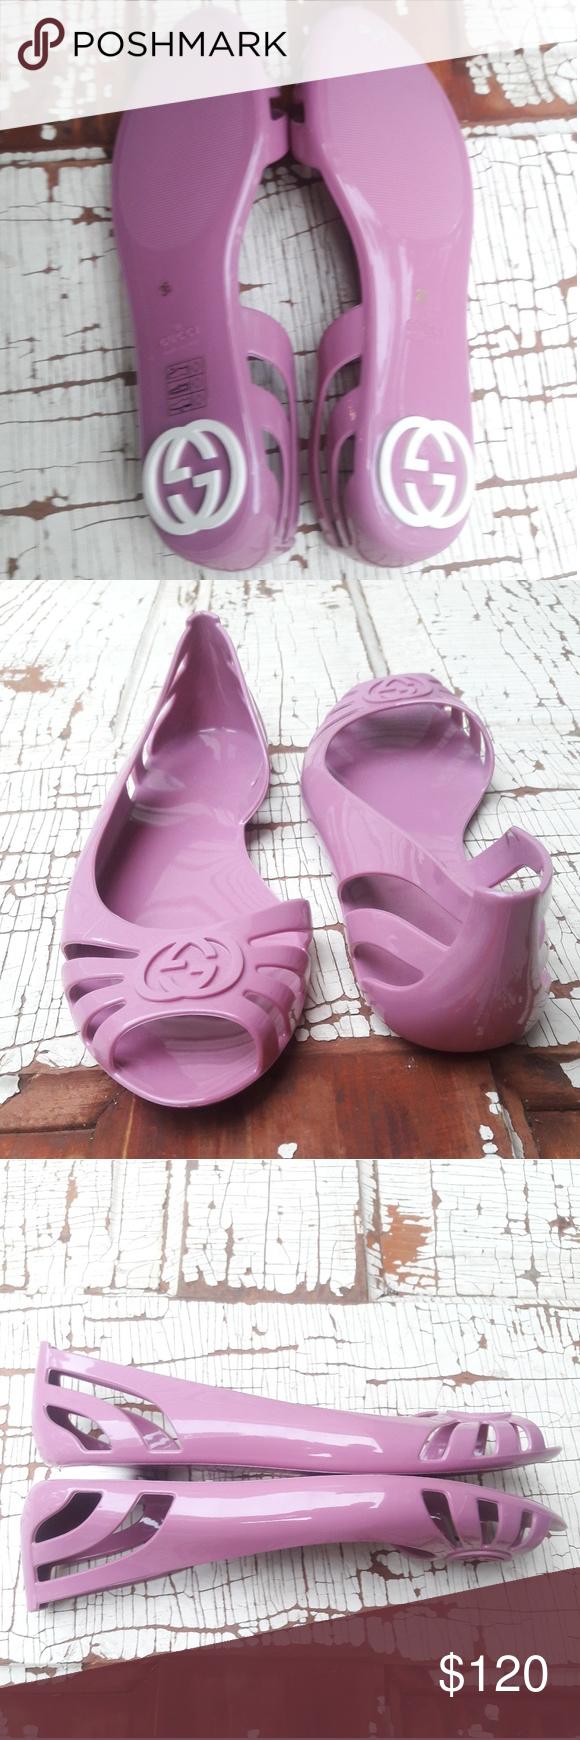 cec1810b45cdc Gucci marola jelly flats pink 36 (us 6)